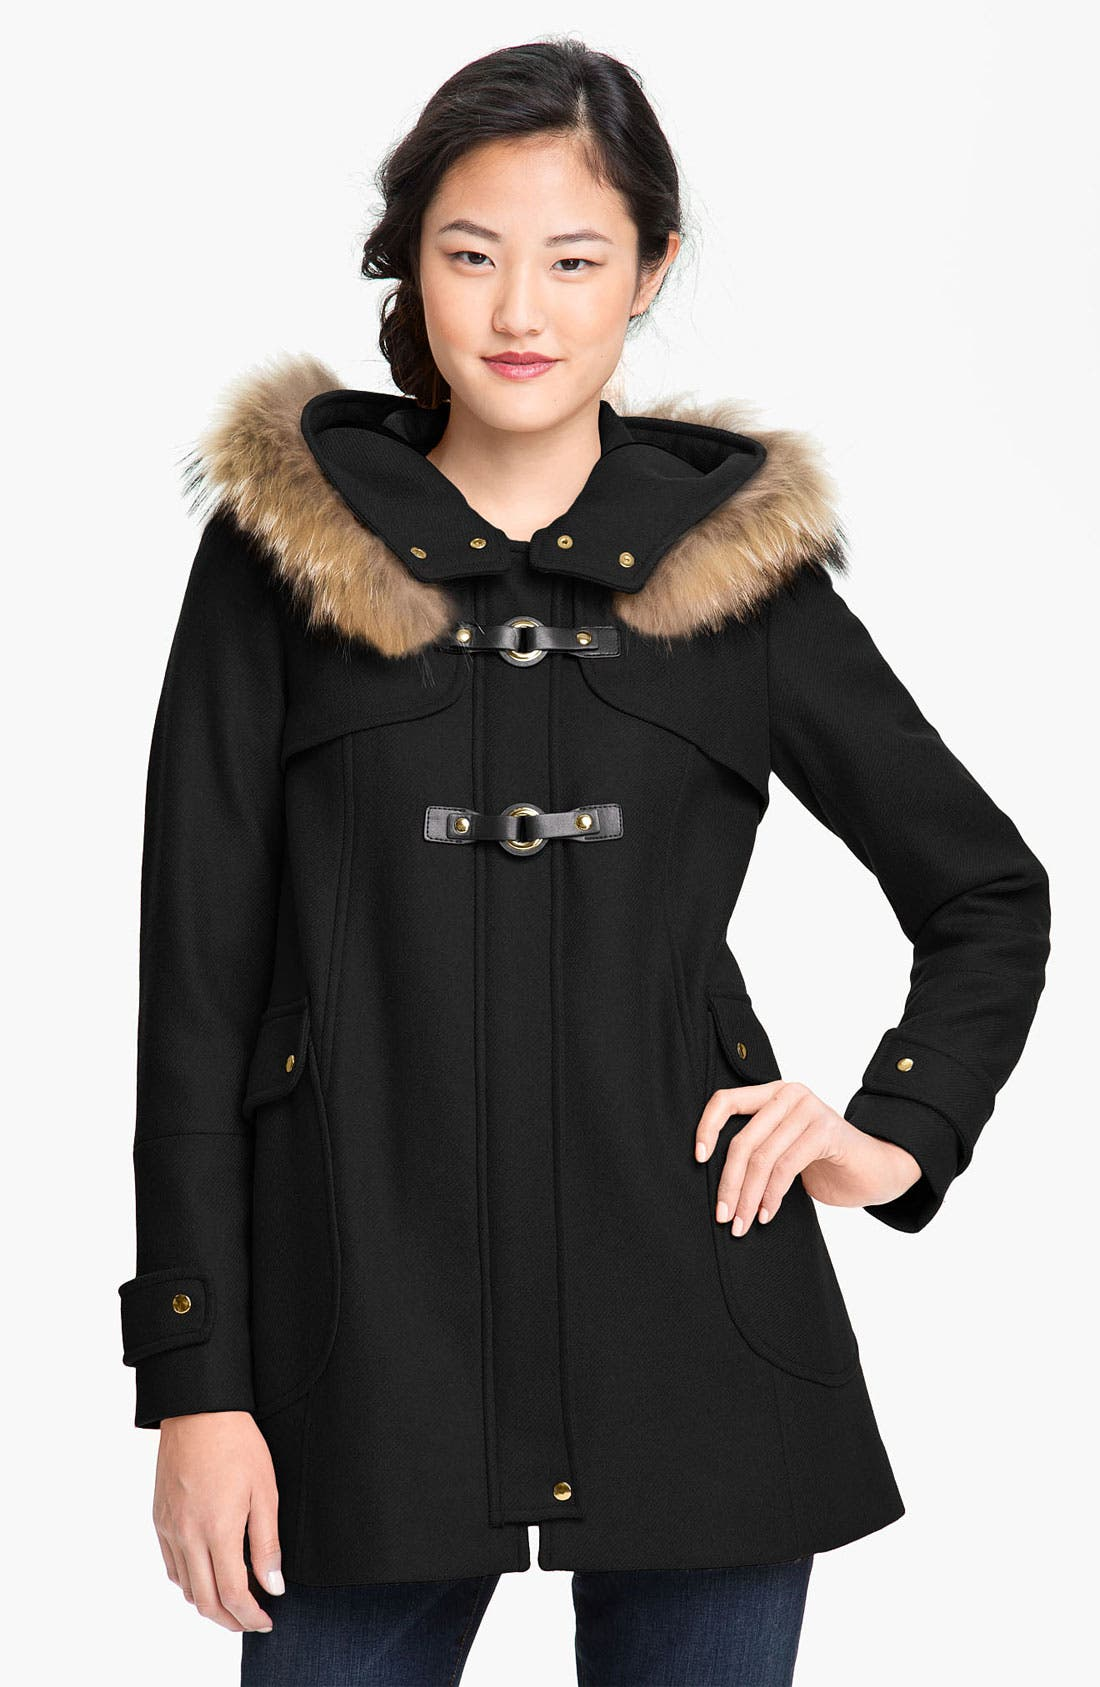 TRINA TURK Hooded Duffle Coat with Genuine Coyote Fur Trim, Main, color, 001